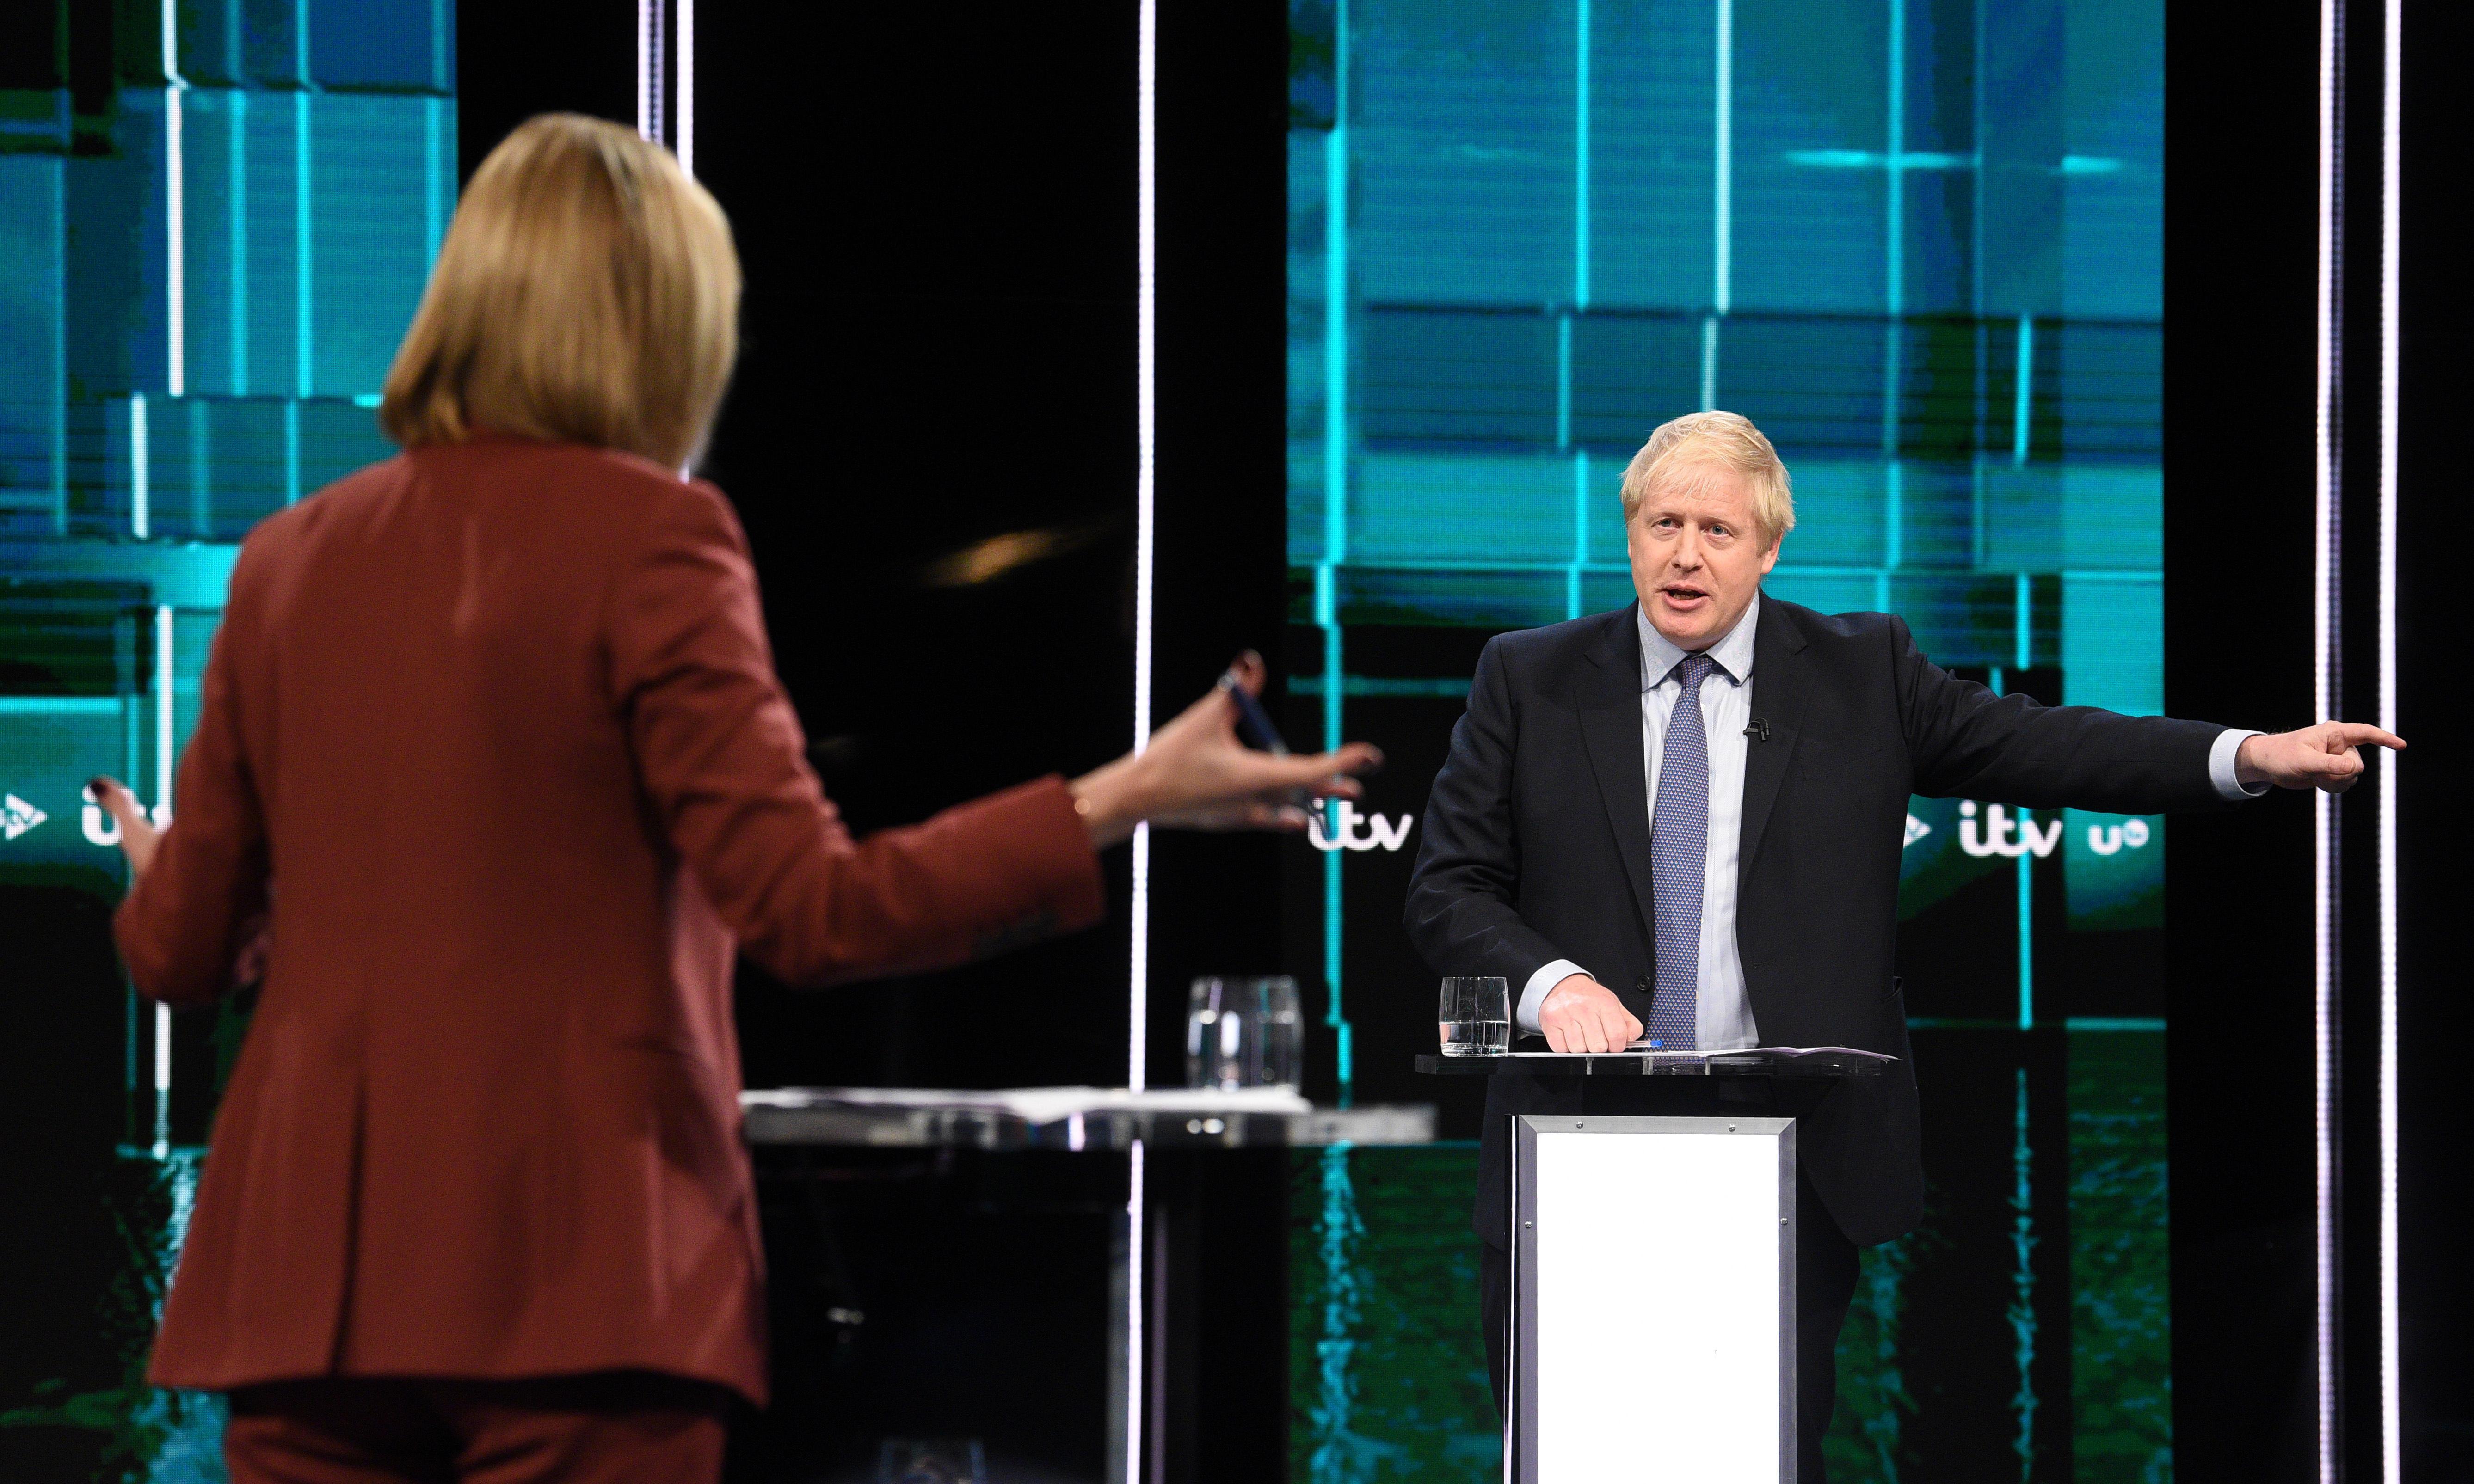 Boris Johnson's national insurance promise will be hard to keep